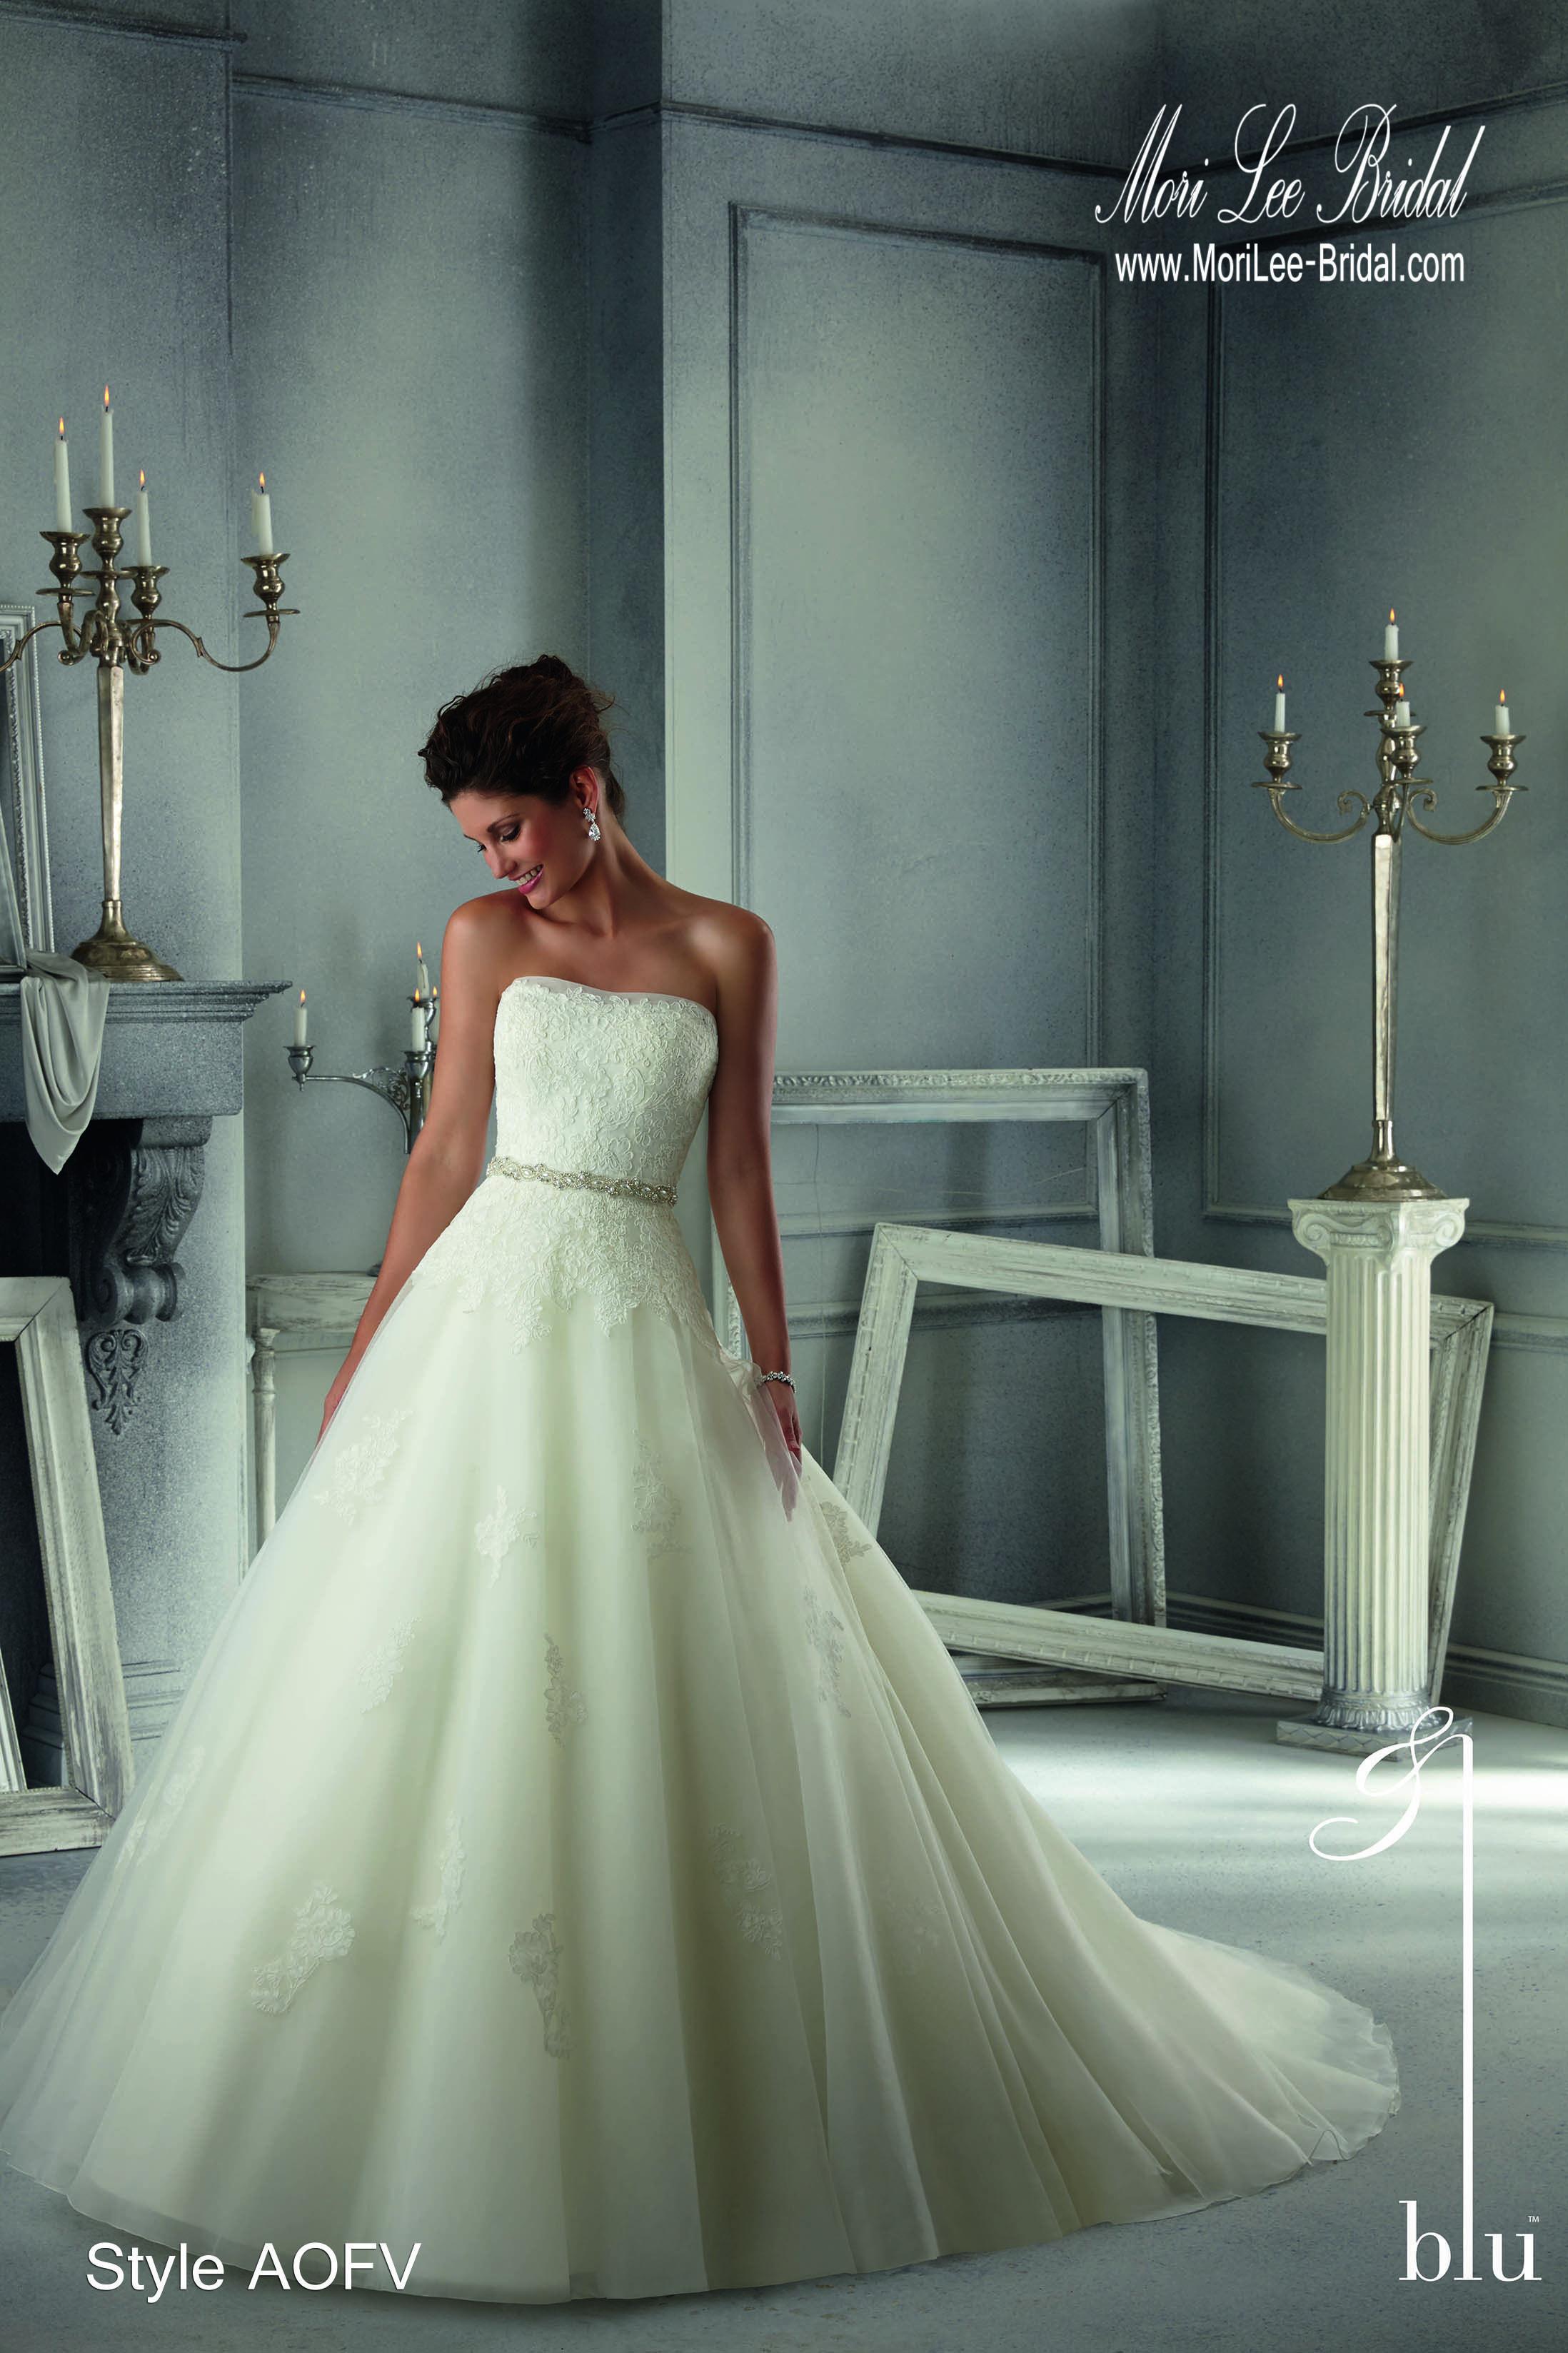 Vintage wedding dress under 500  Style AOFV Alencon Lace on Tulle with Beaded Organza Sash